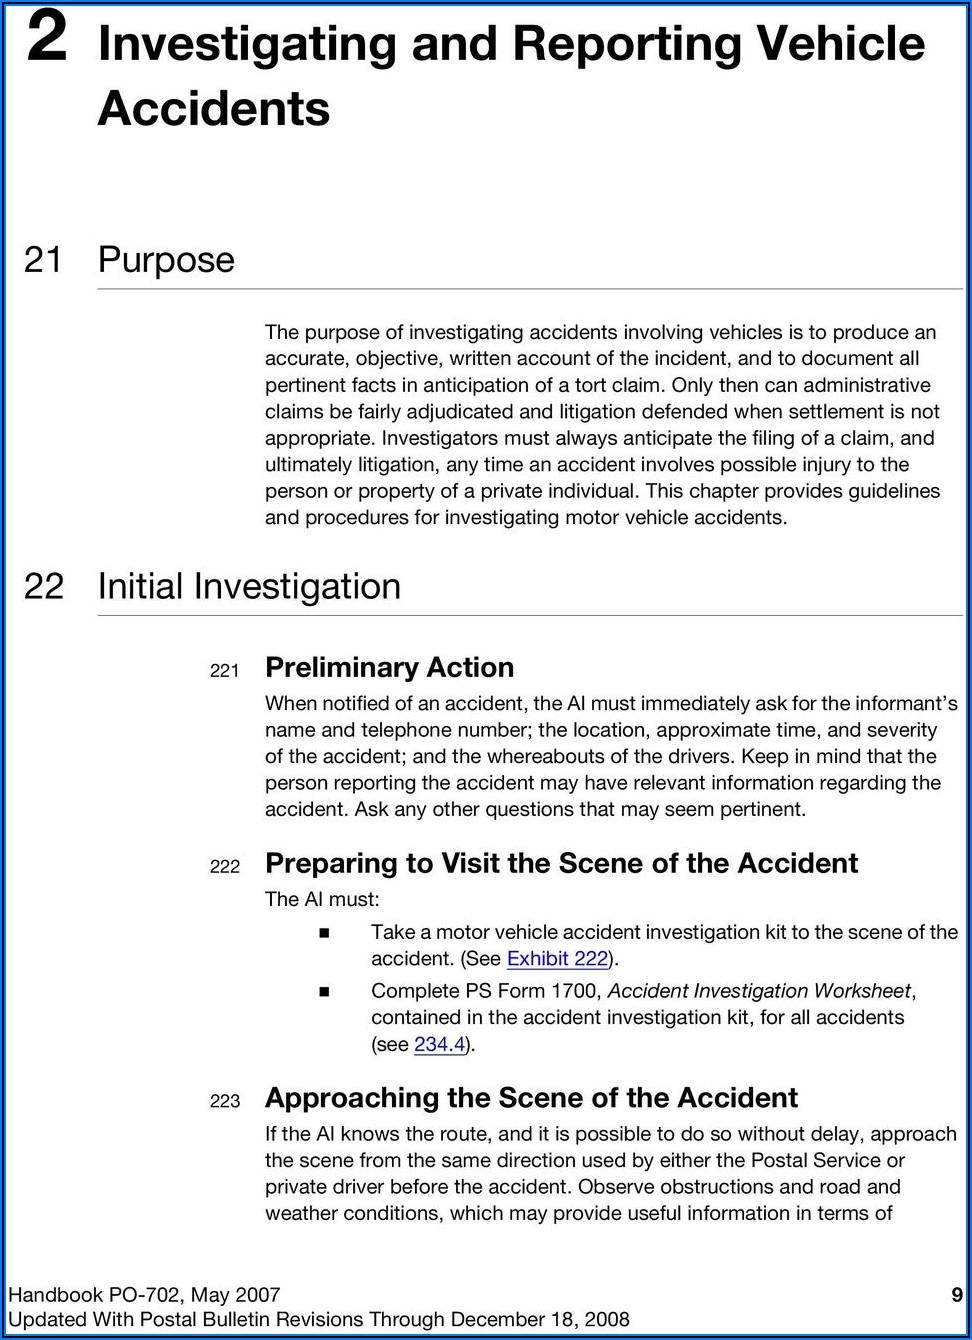 Usps Auto Accident Claim Form